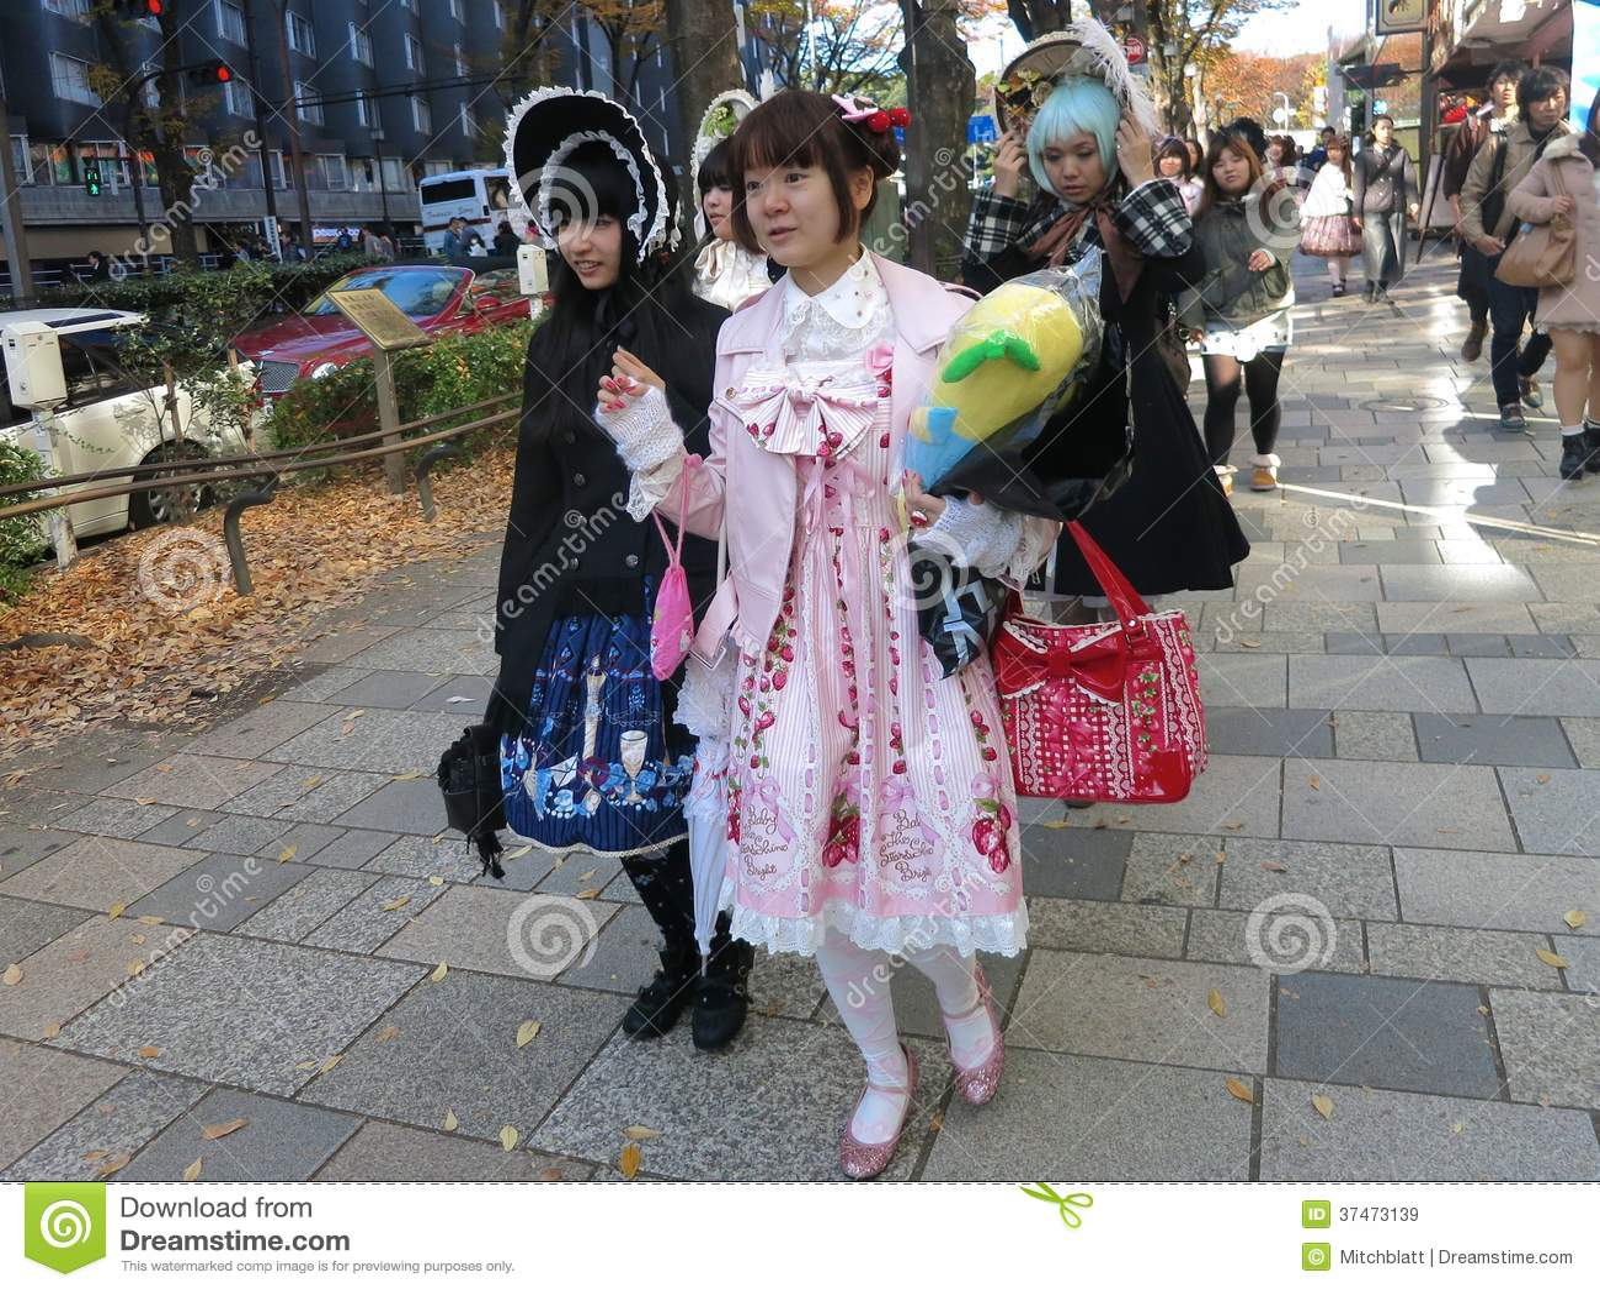 Lolita Fashion Girls Walking Down the Street